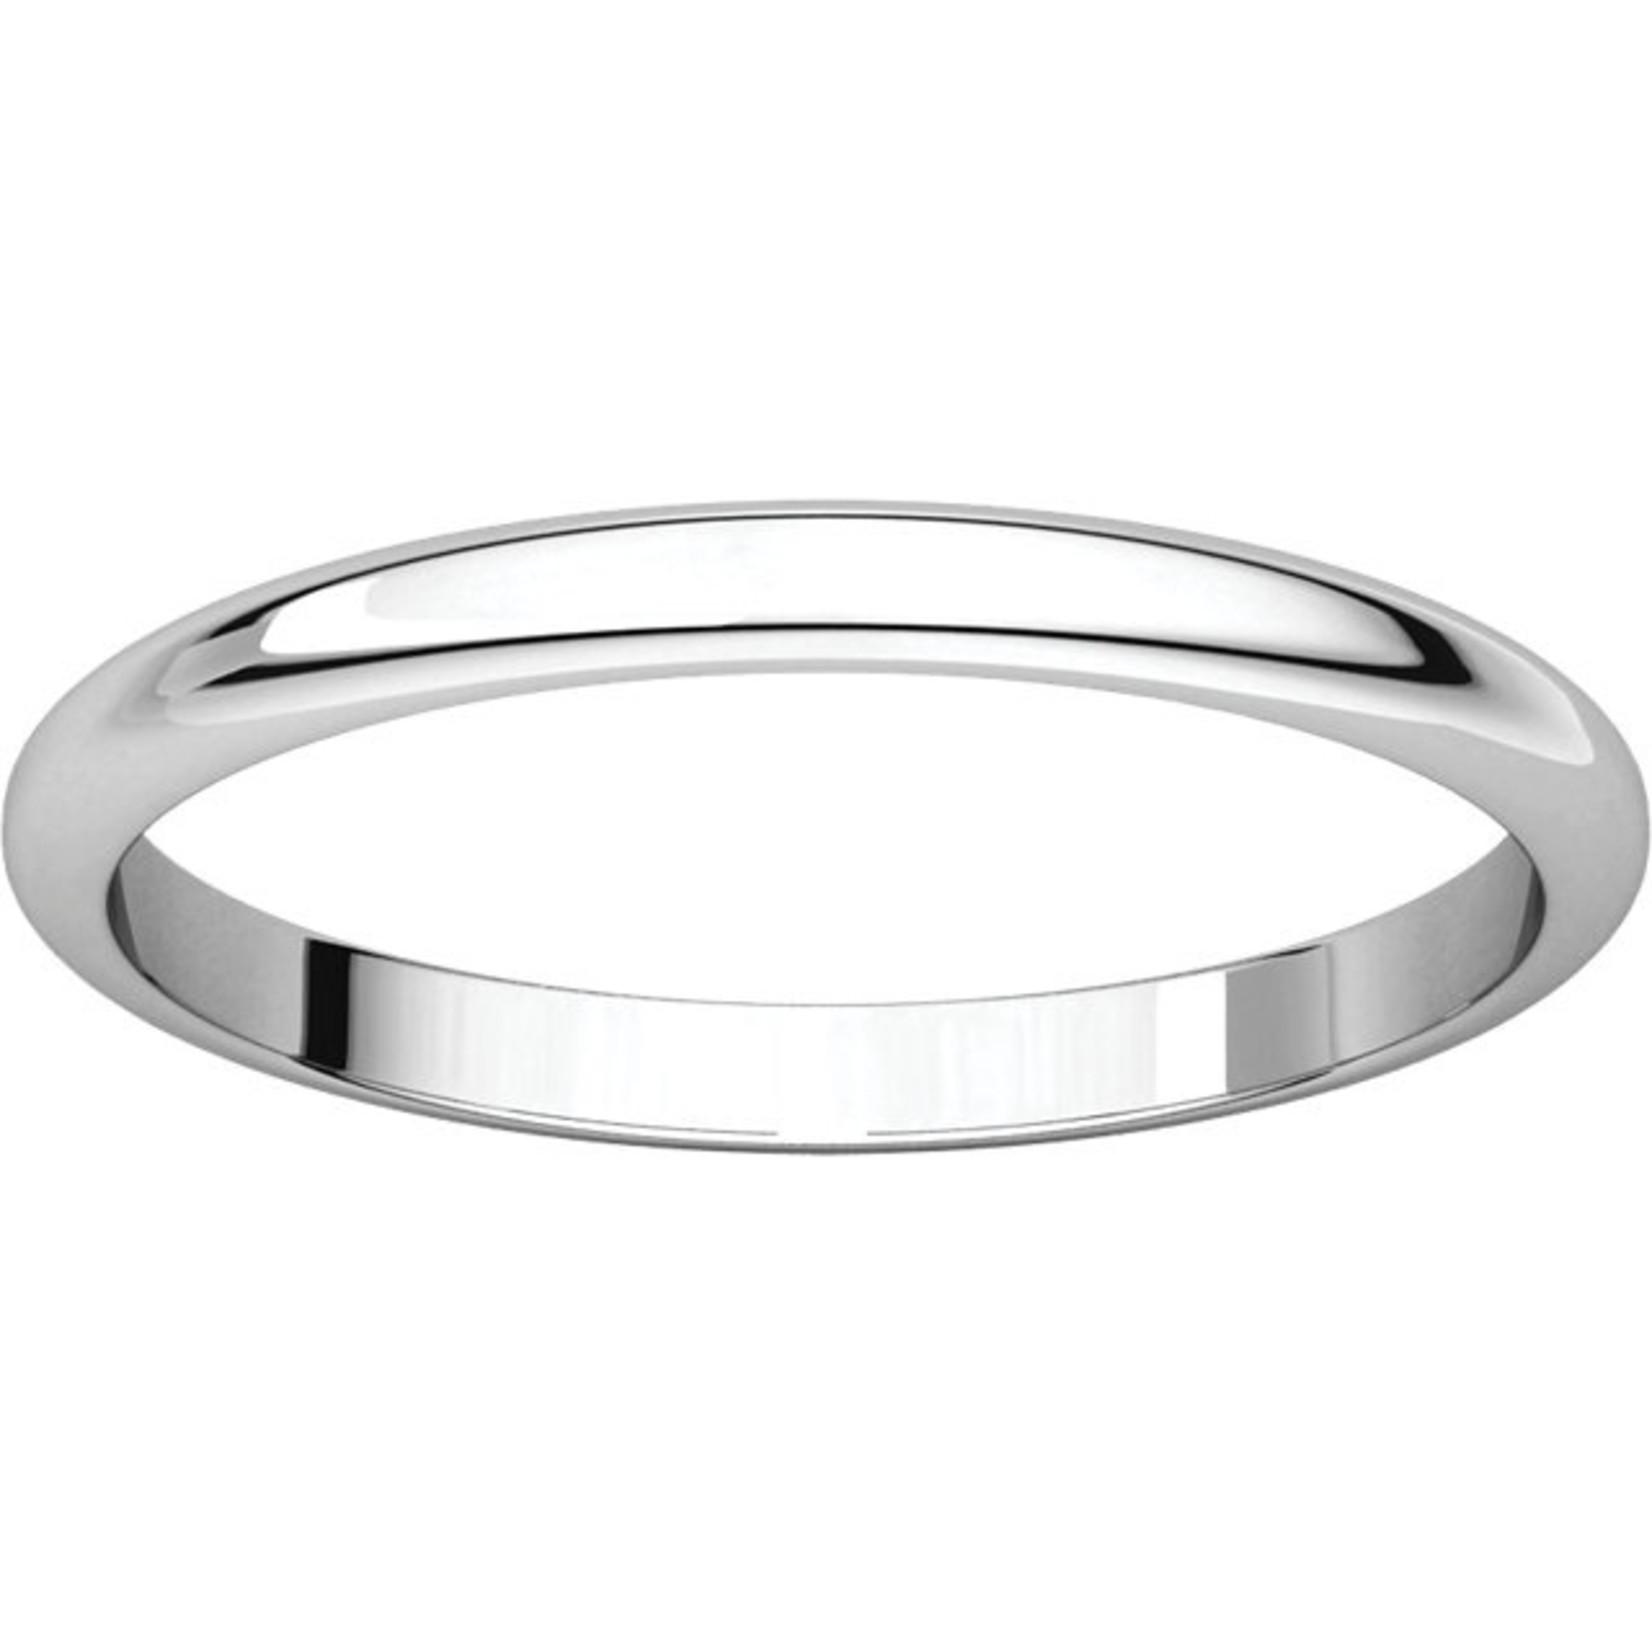 KBH Jewels Reclaimed Classic Ring 2mm